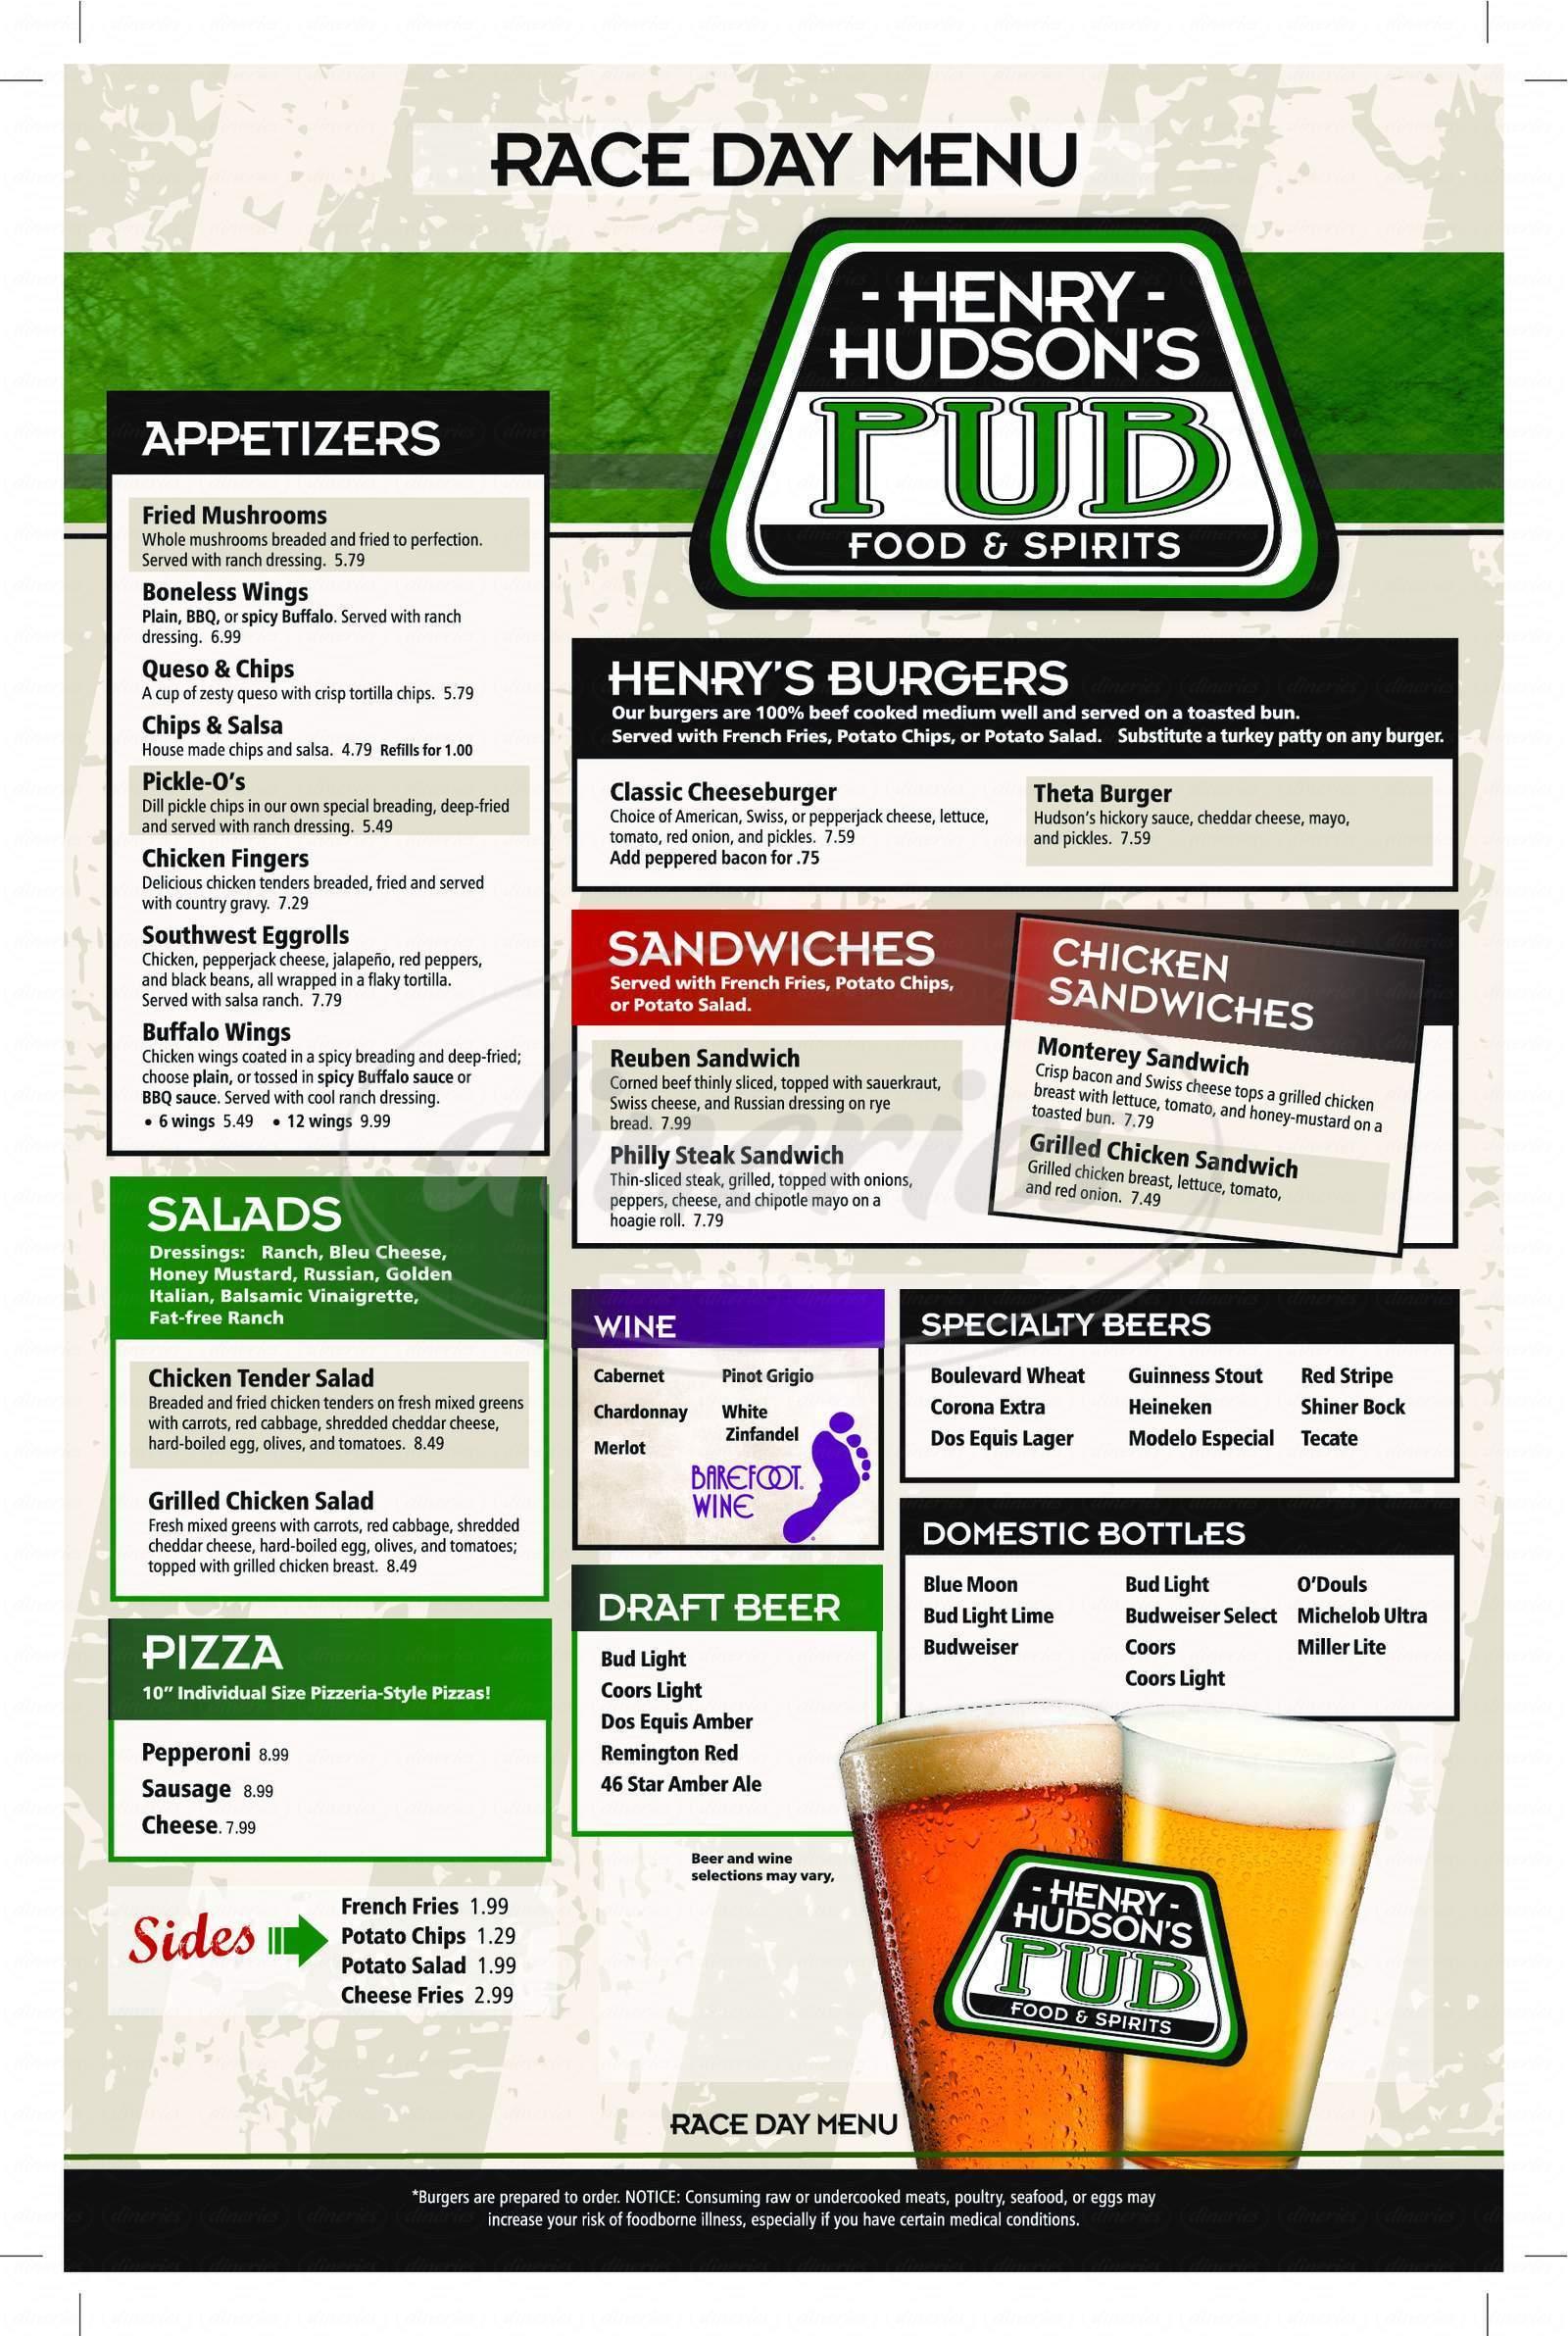 menu for Henry Hudson's